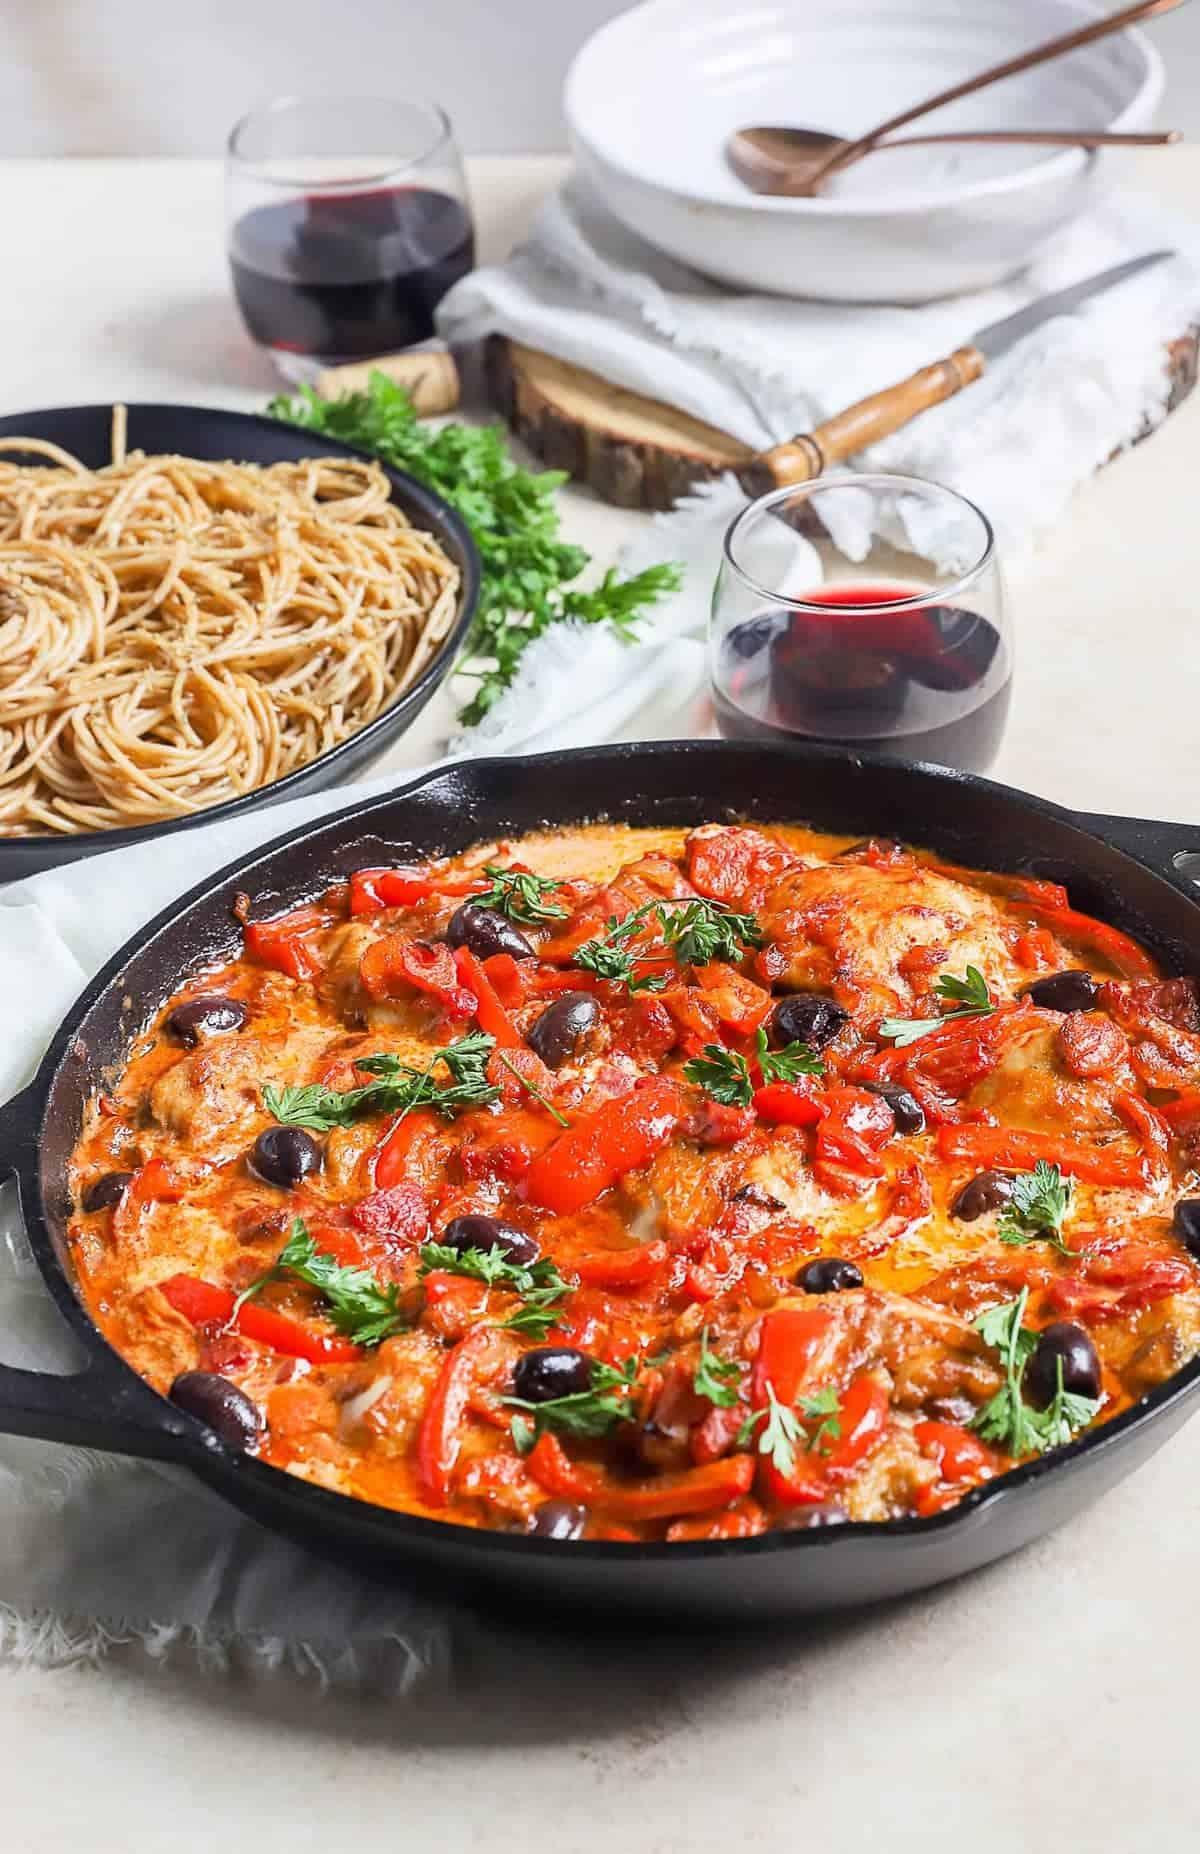 Chicken Cacciatore garnished with fresh herbs